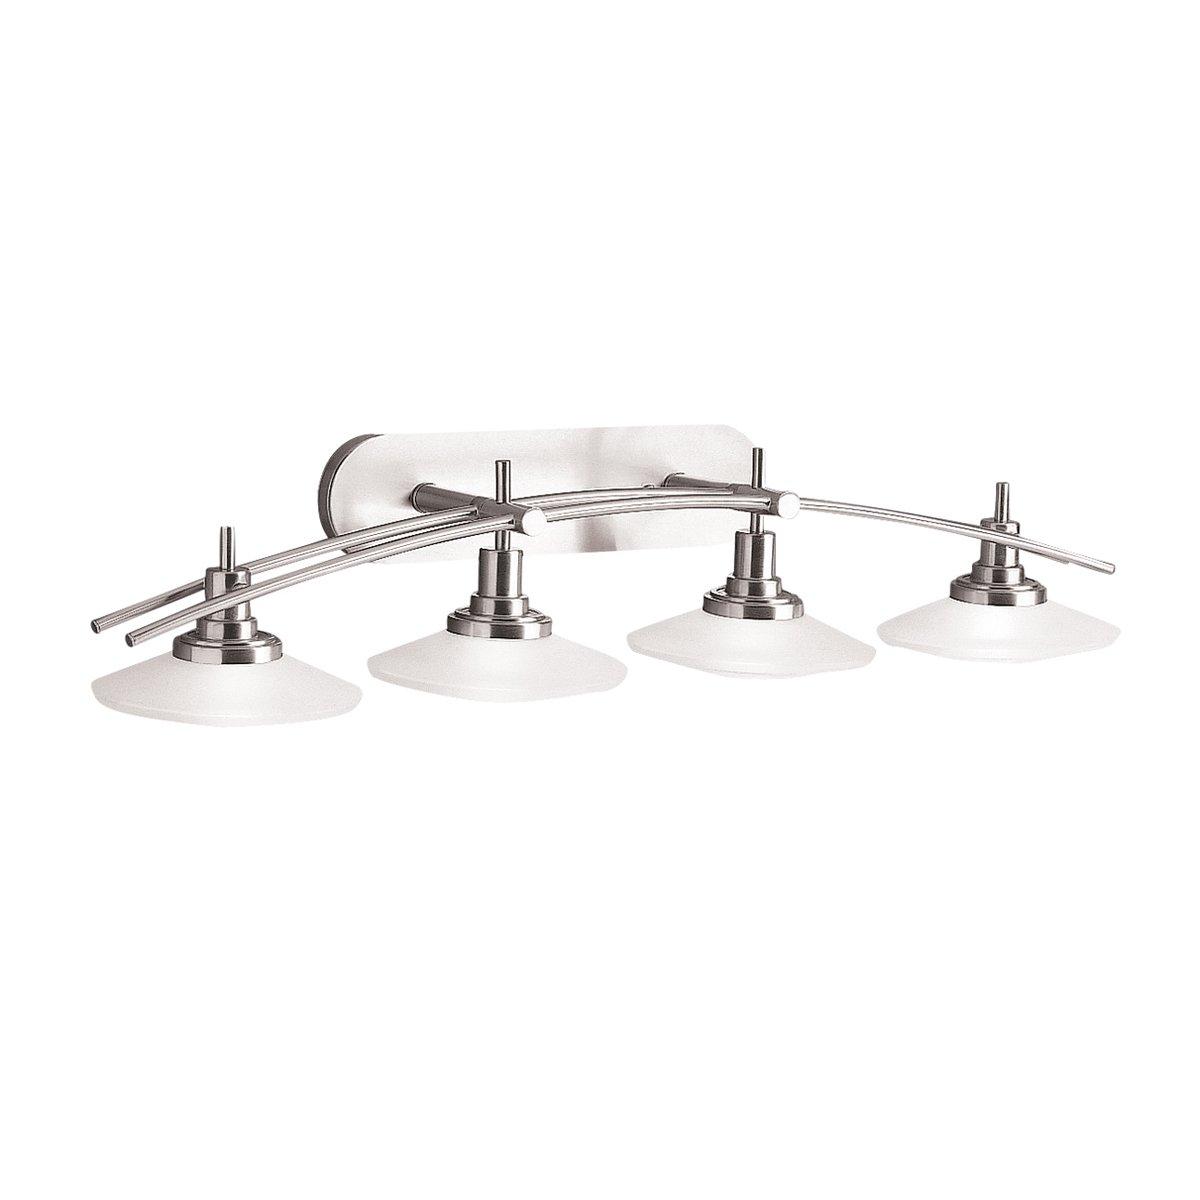 kichler 6463ni three light bath vanity lighting fixtures amazoncom